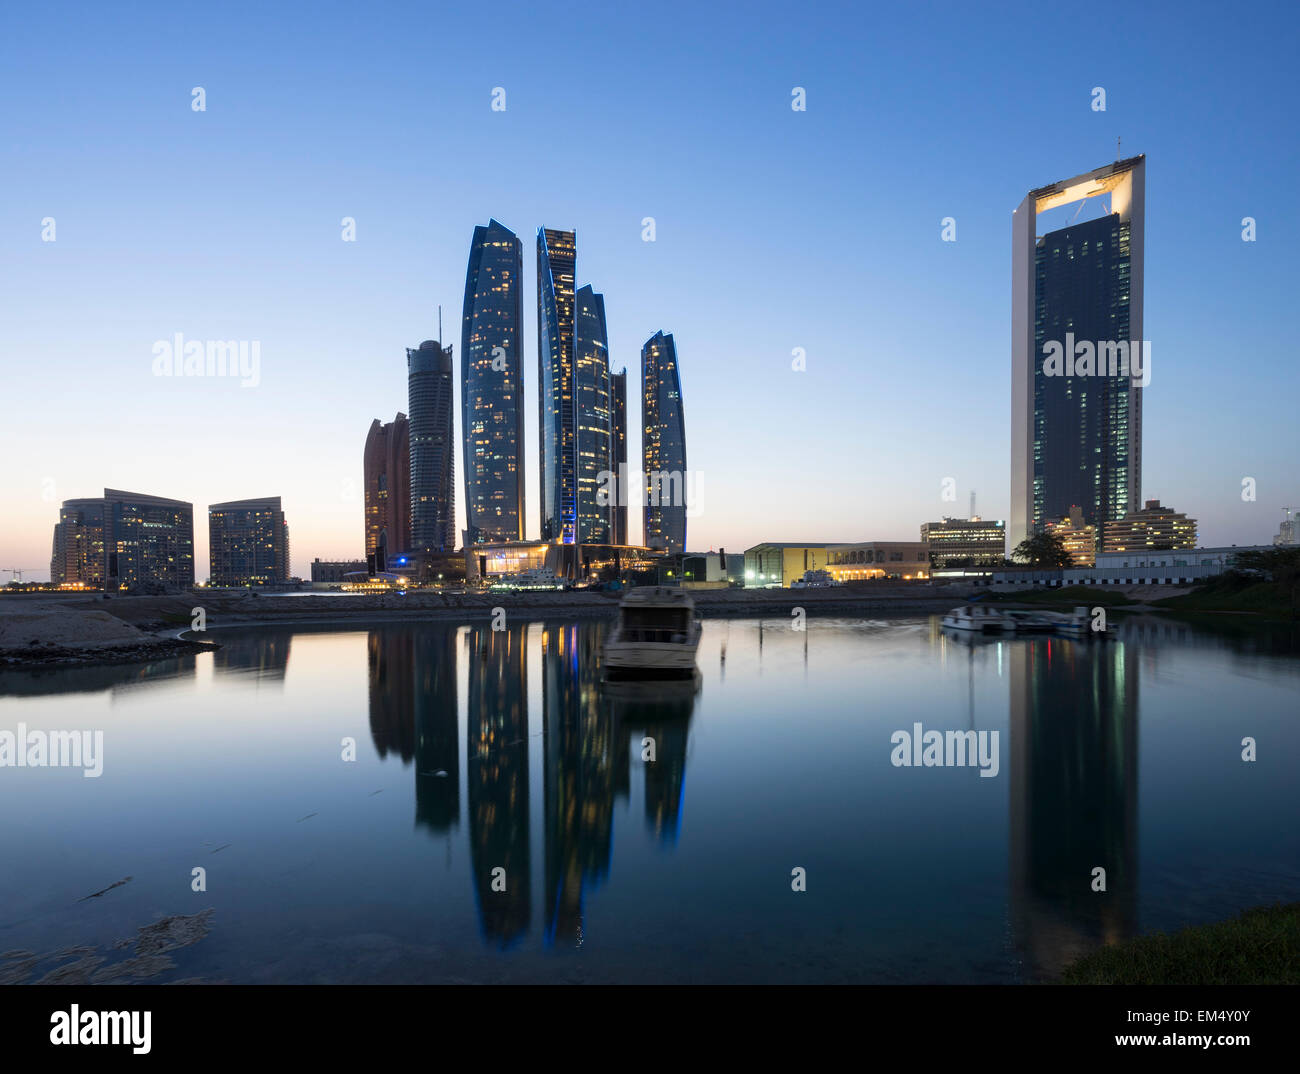 Night skyline view of Etihad Towers  in Abu Dhabi in United Arab Emirates - Stock Image